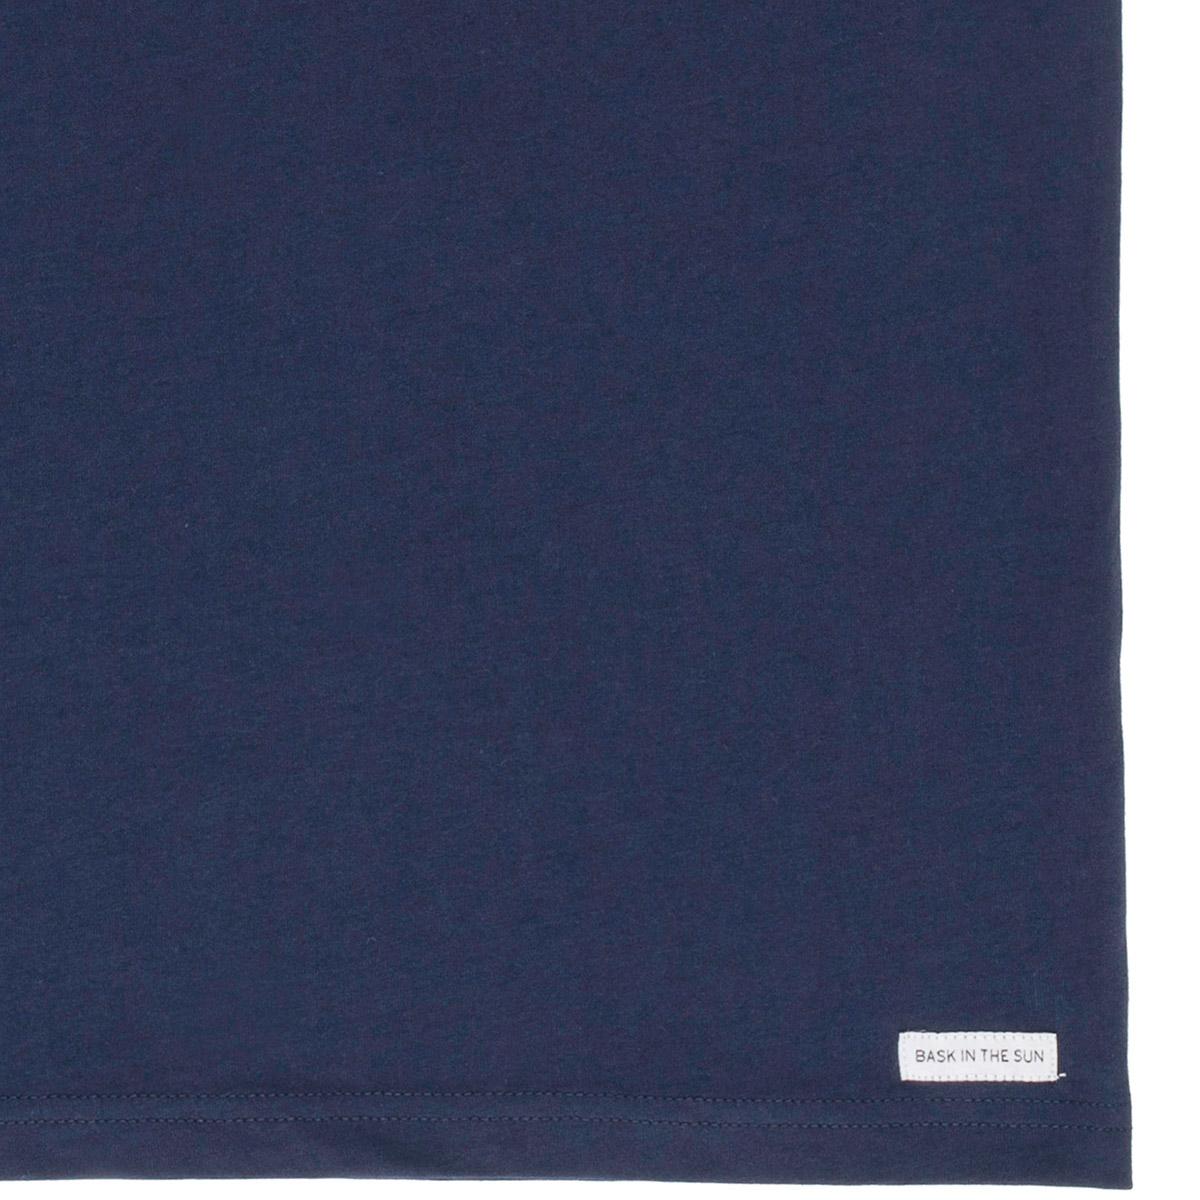 T-shirt en coton bio navy marees - Bask in the Sun num 3